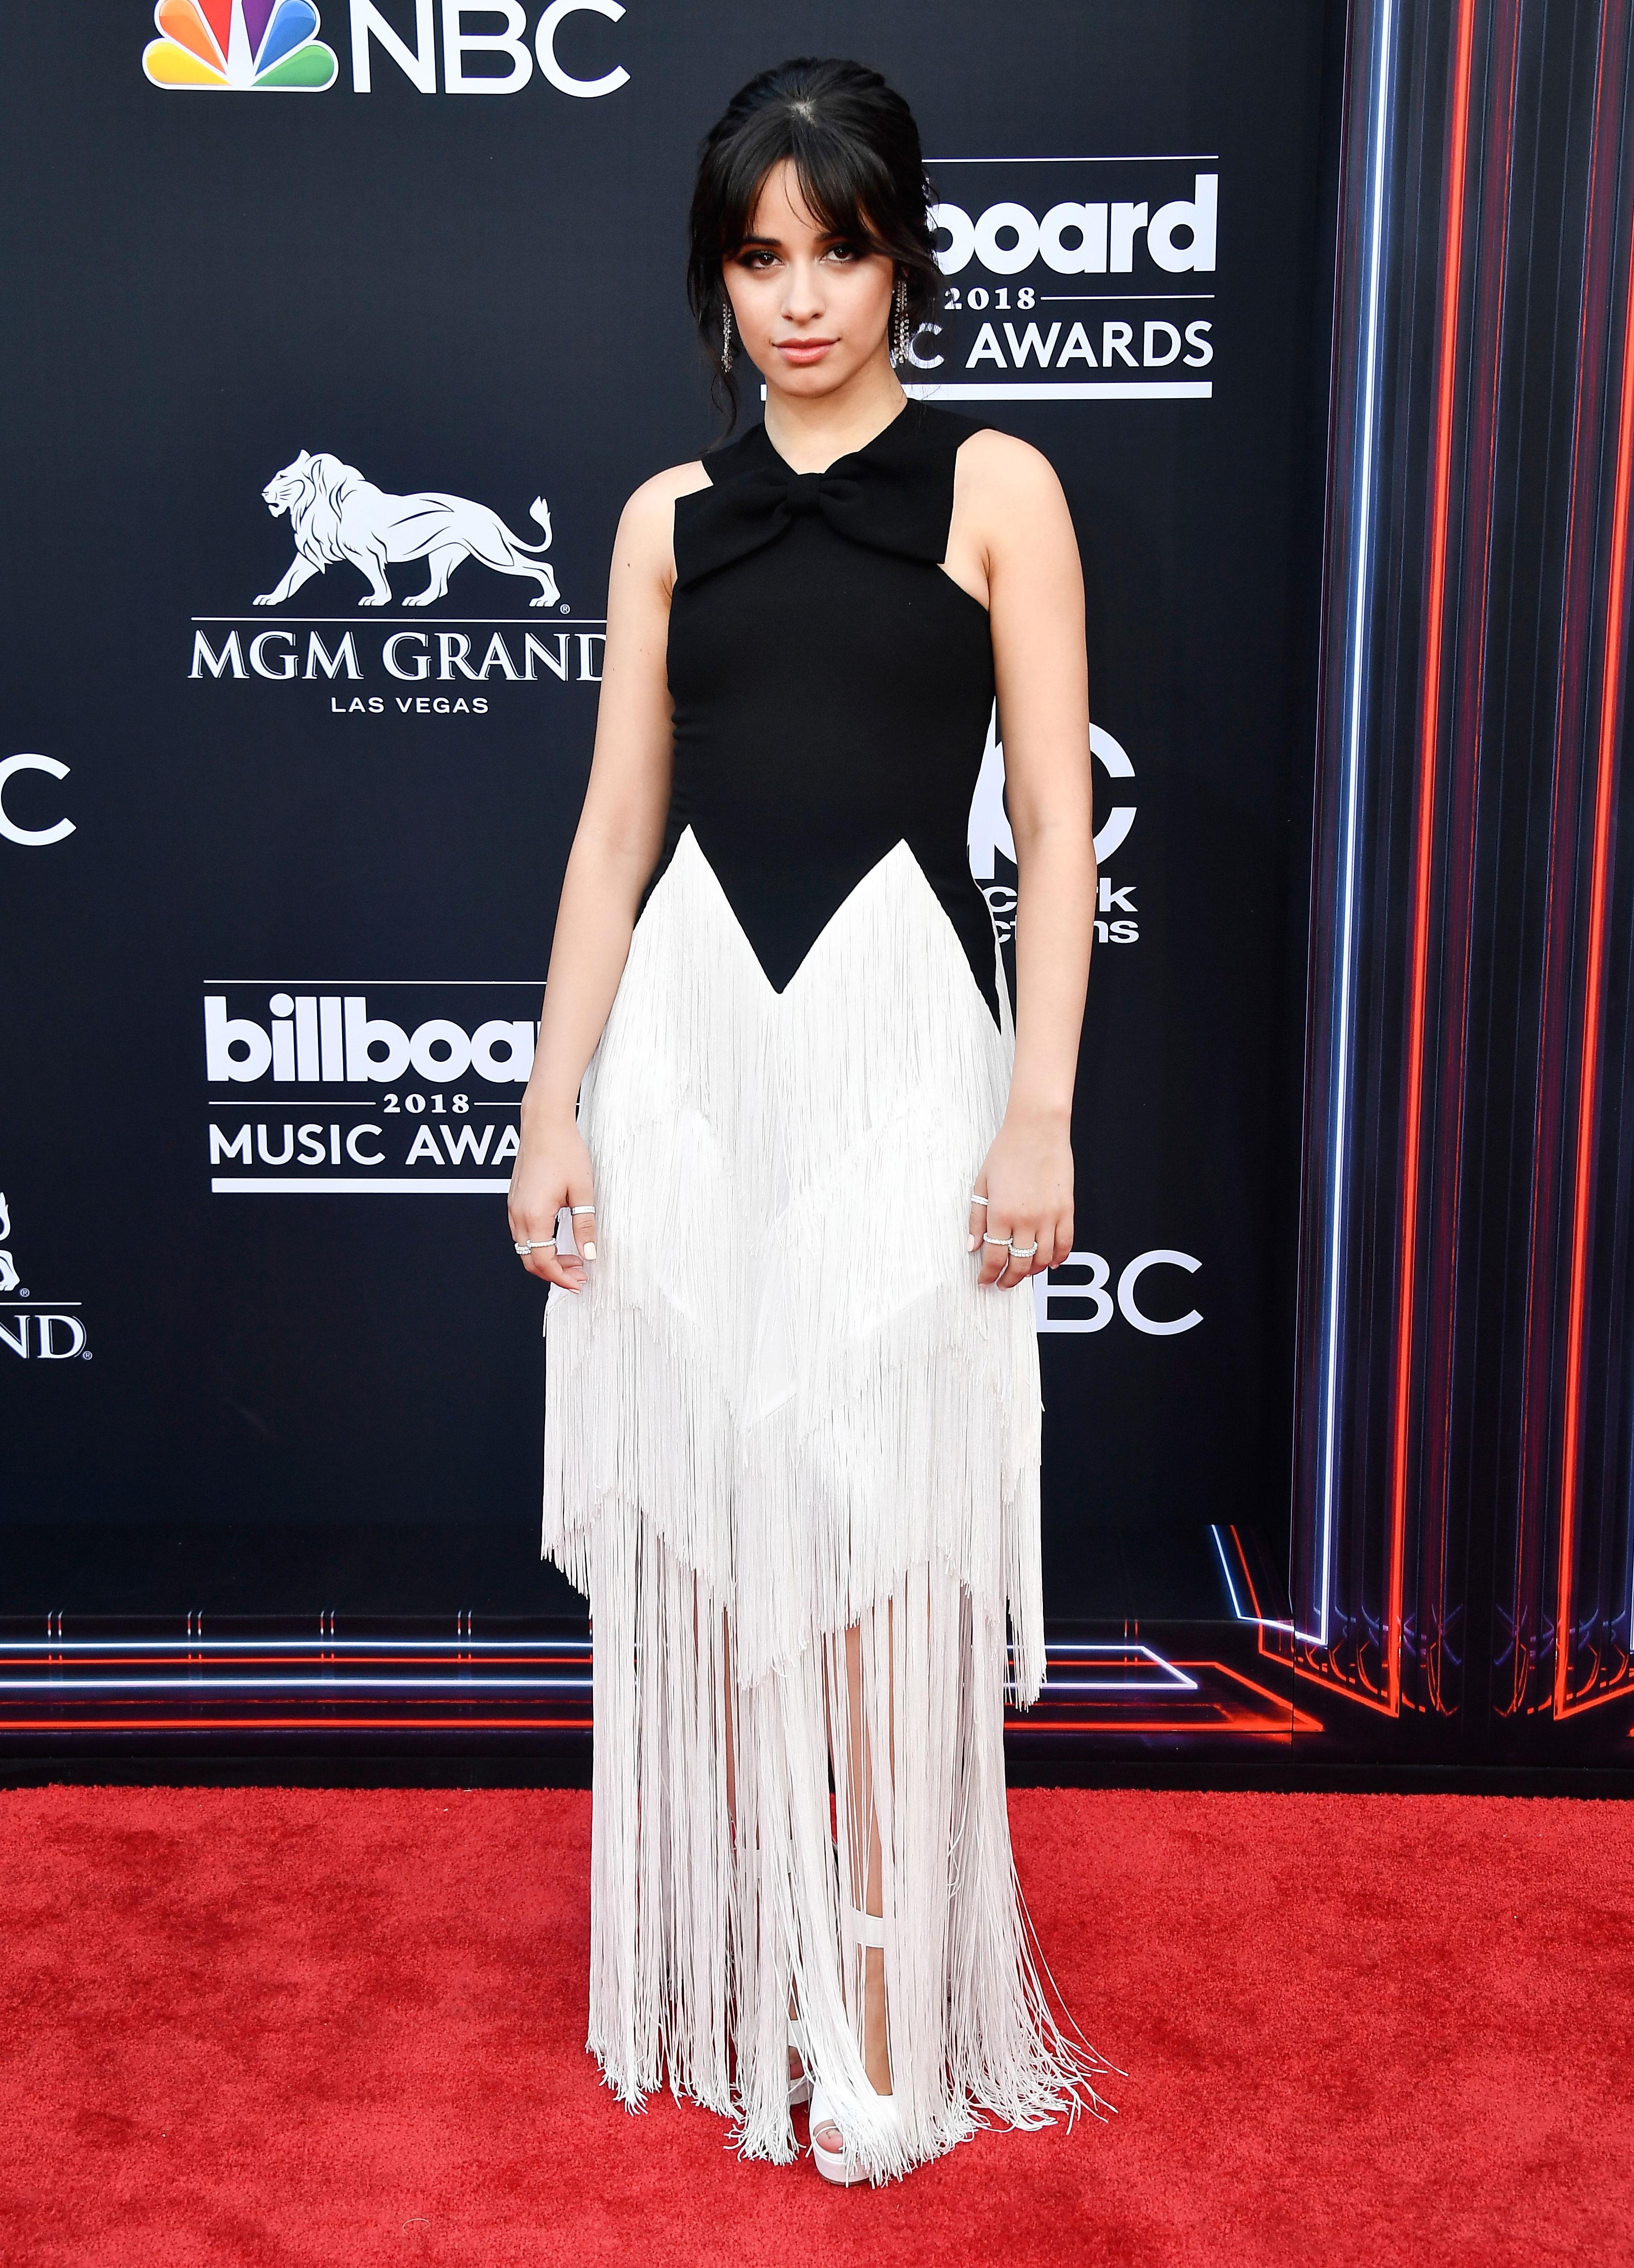 Billboard Music Awards 2018 Red Carpet Fashion: See Celeb Dresses